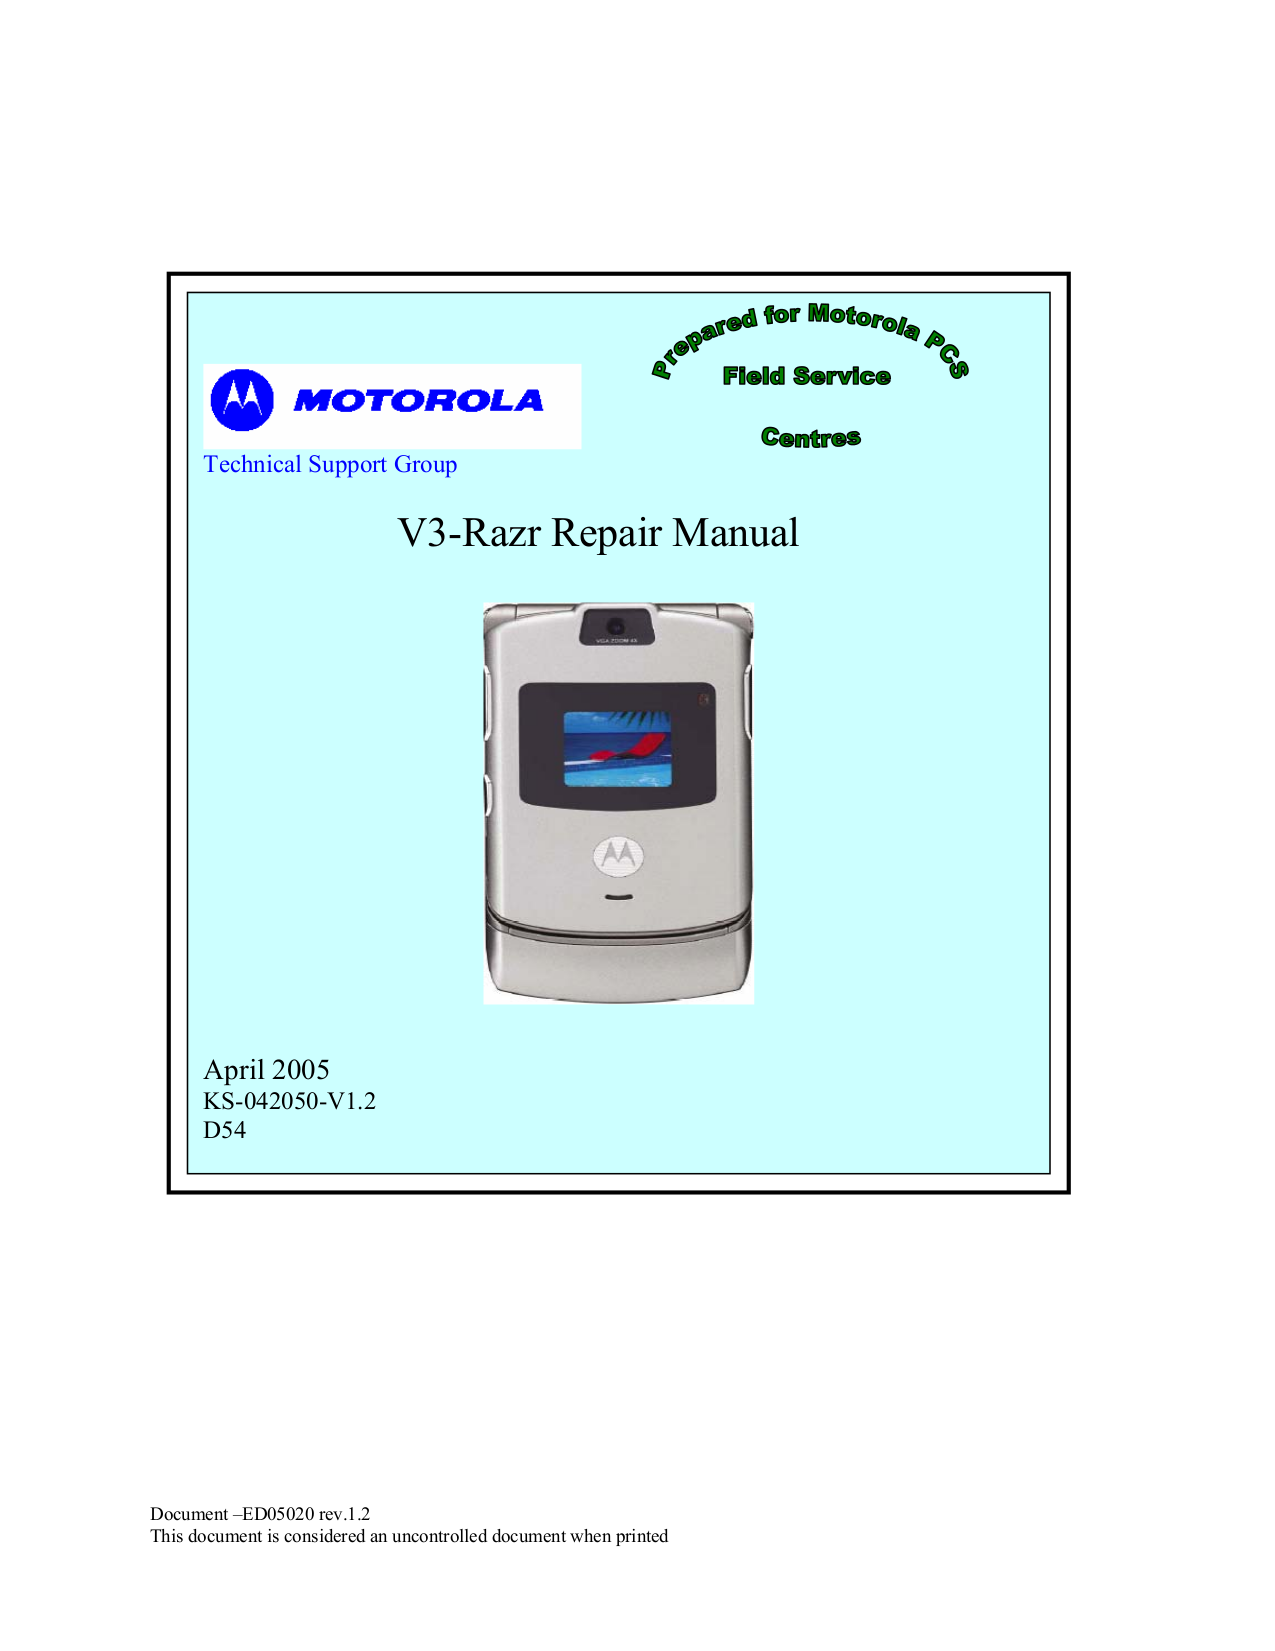 download free pdf for motorola razr v3i cell phone manual rh umlib com RAZR V3i Phones motorola razr v3i service manual